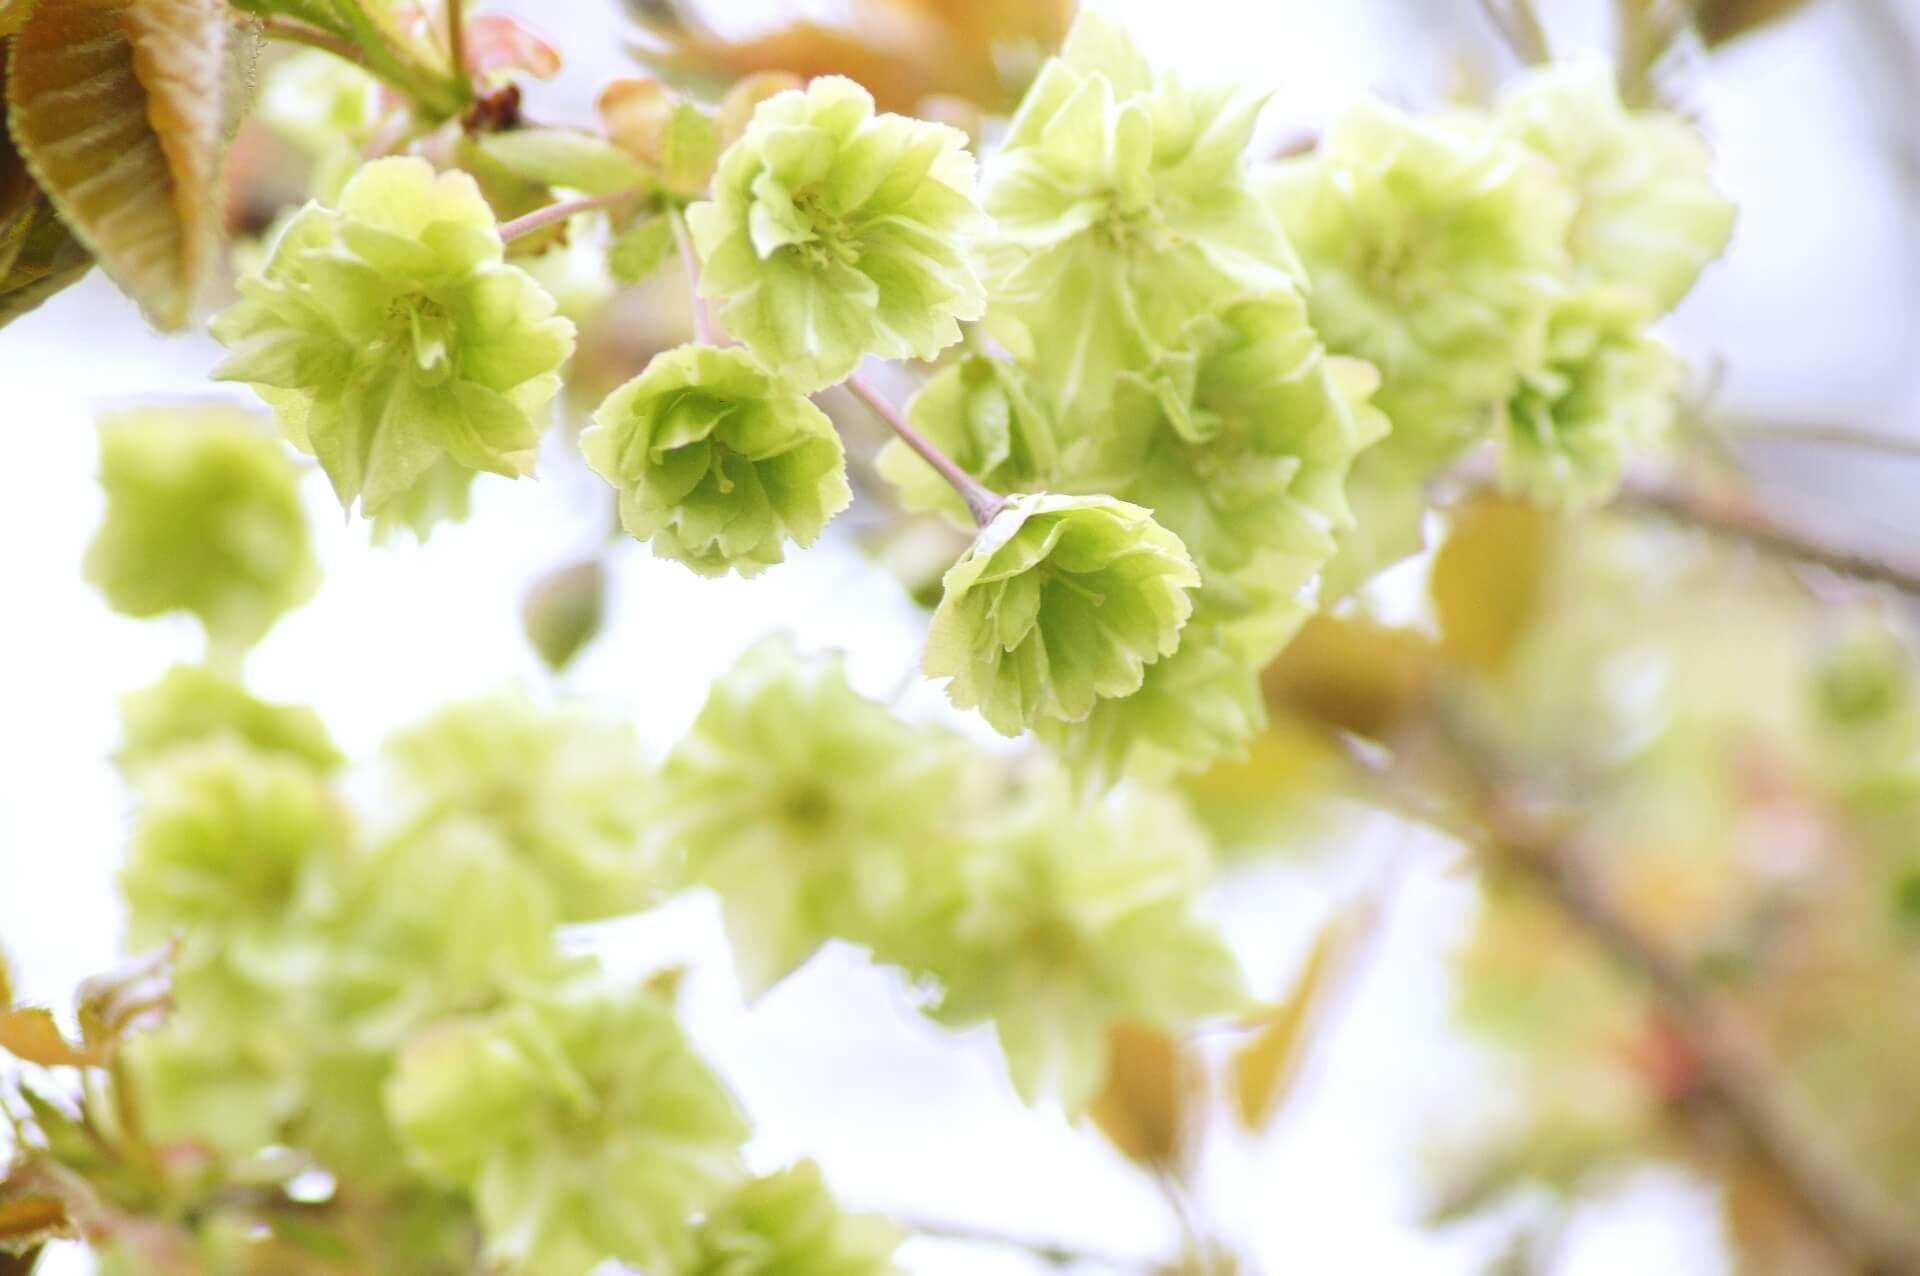 gyoikozakura-cherry-blossom